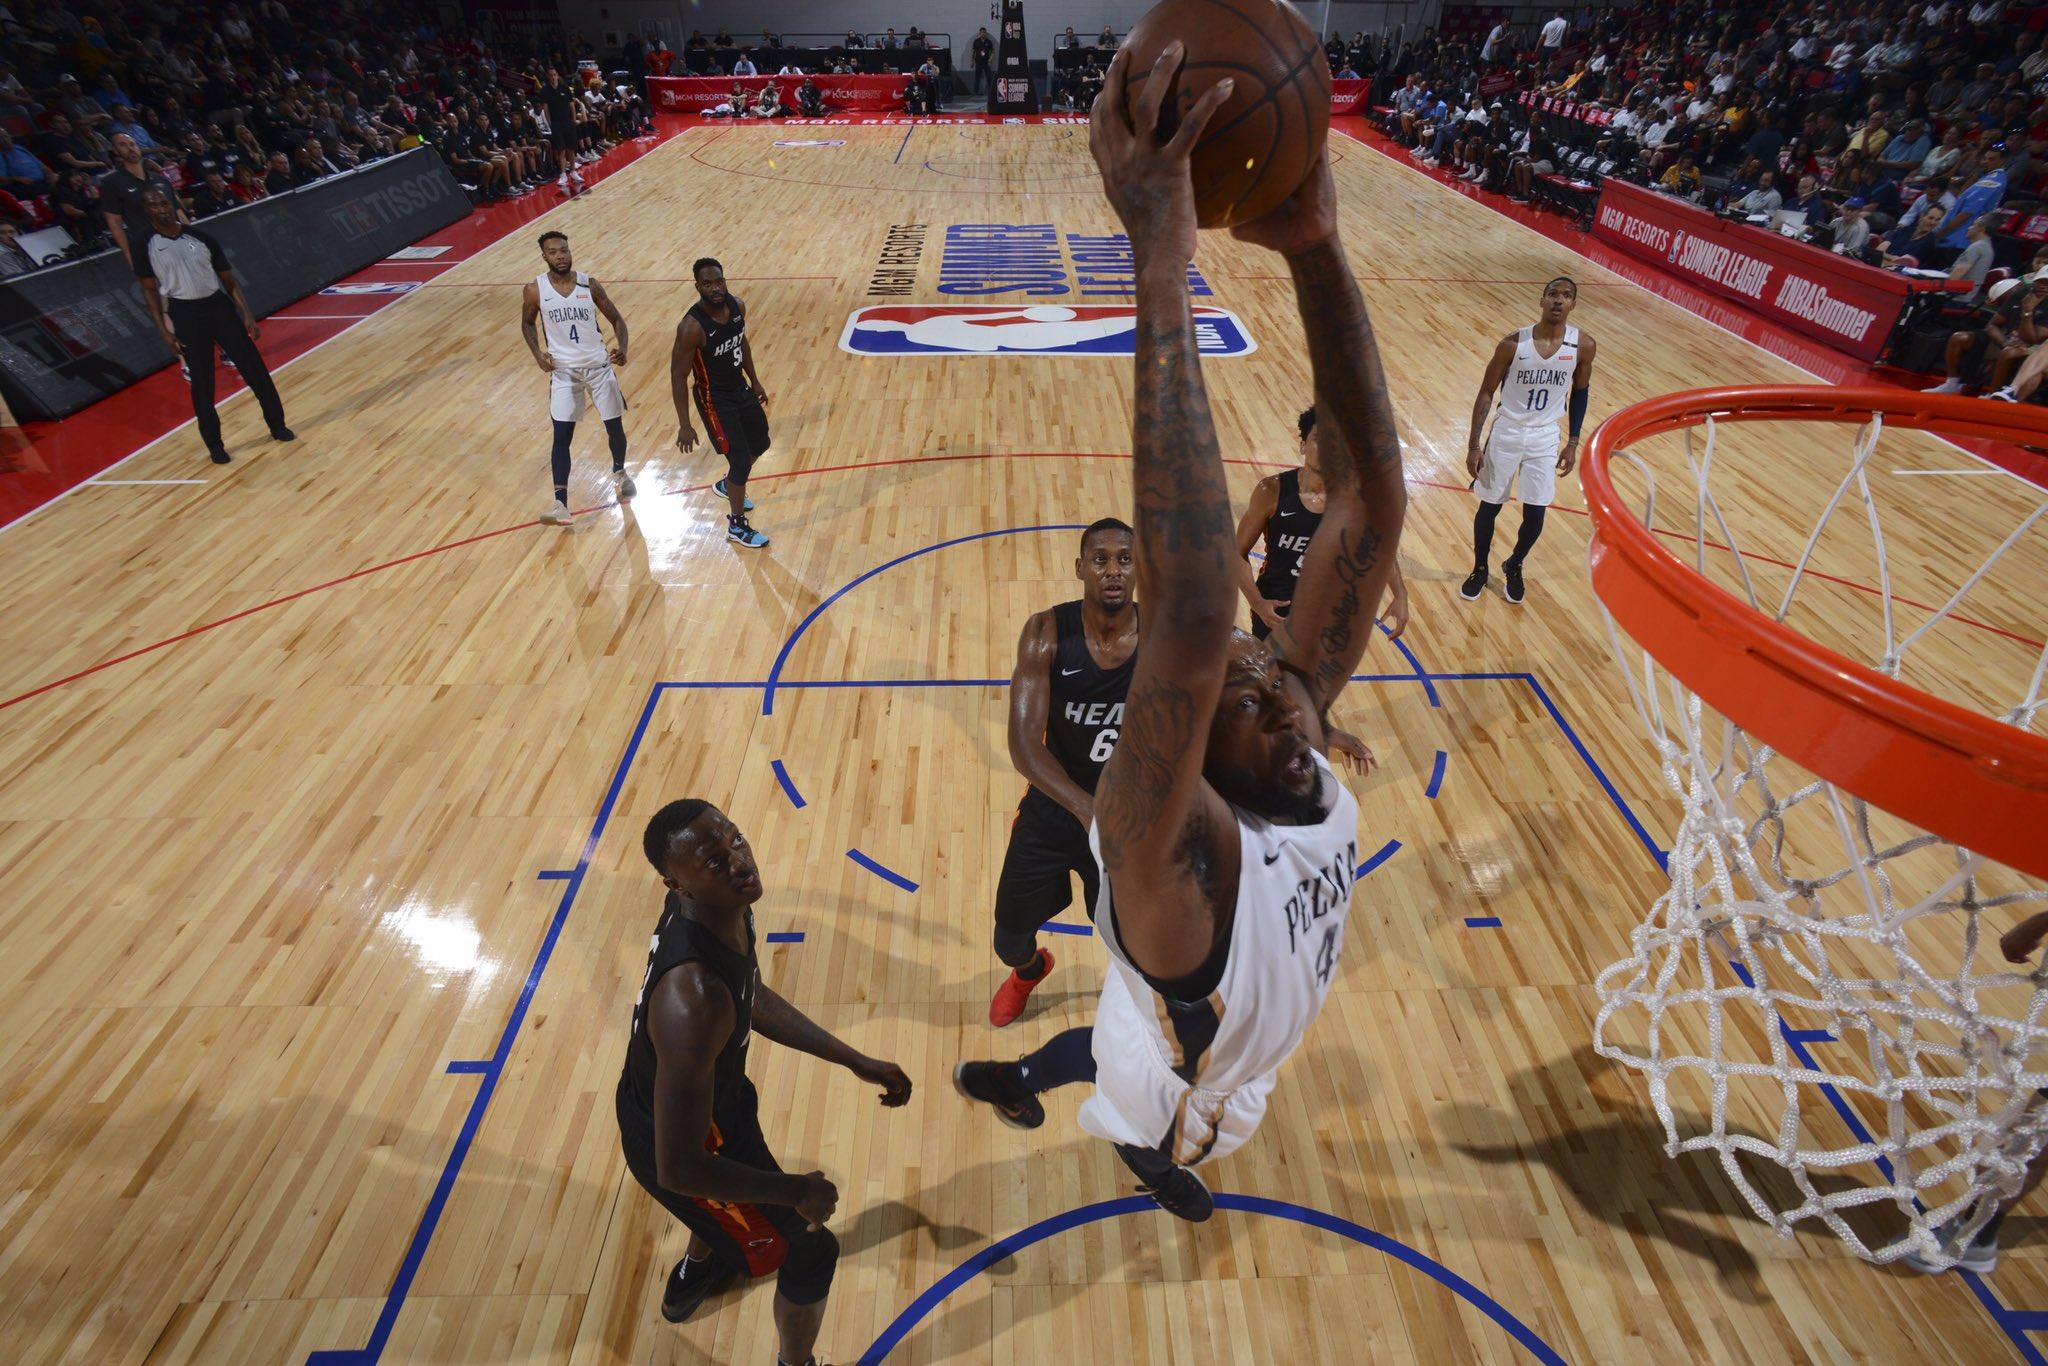 #Pelicans go into Game 3 today!  �� @DetroitPistons  �� @CoxPavilion  ⏰  2:00PM CT �� @ESPNU  #NBASummer https://t.co/TLH9ThEzVC